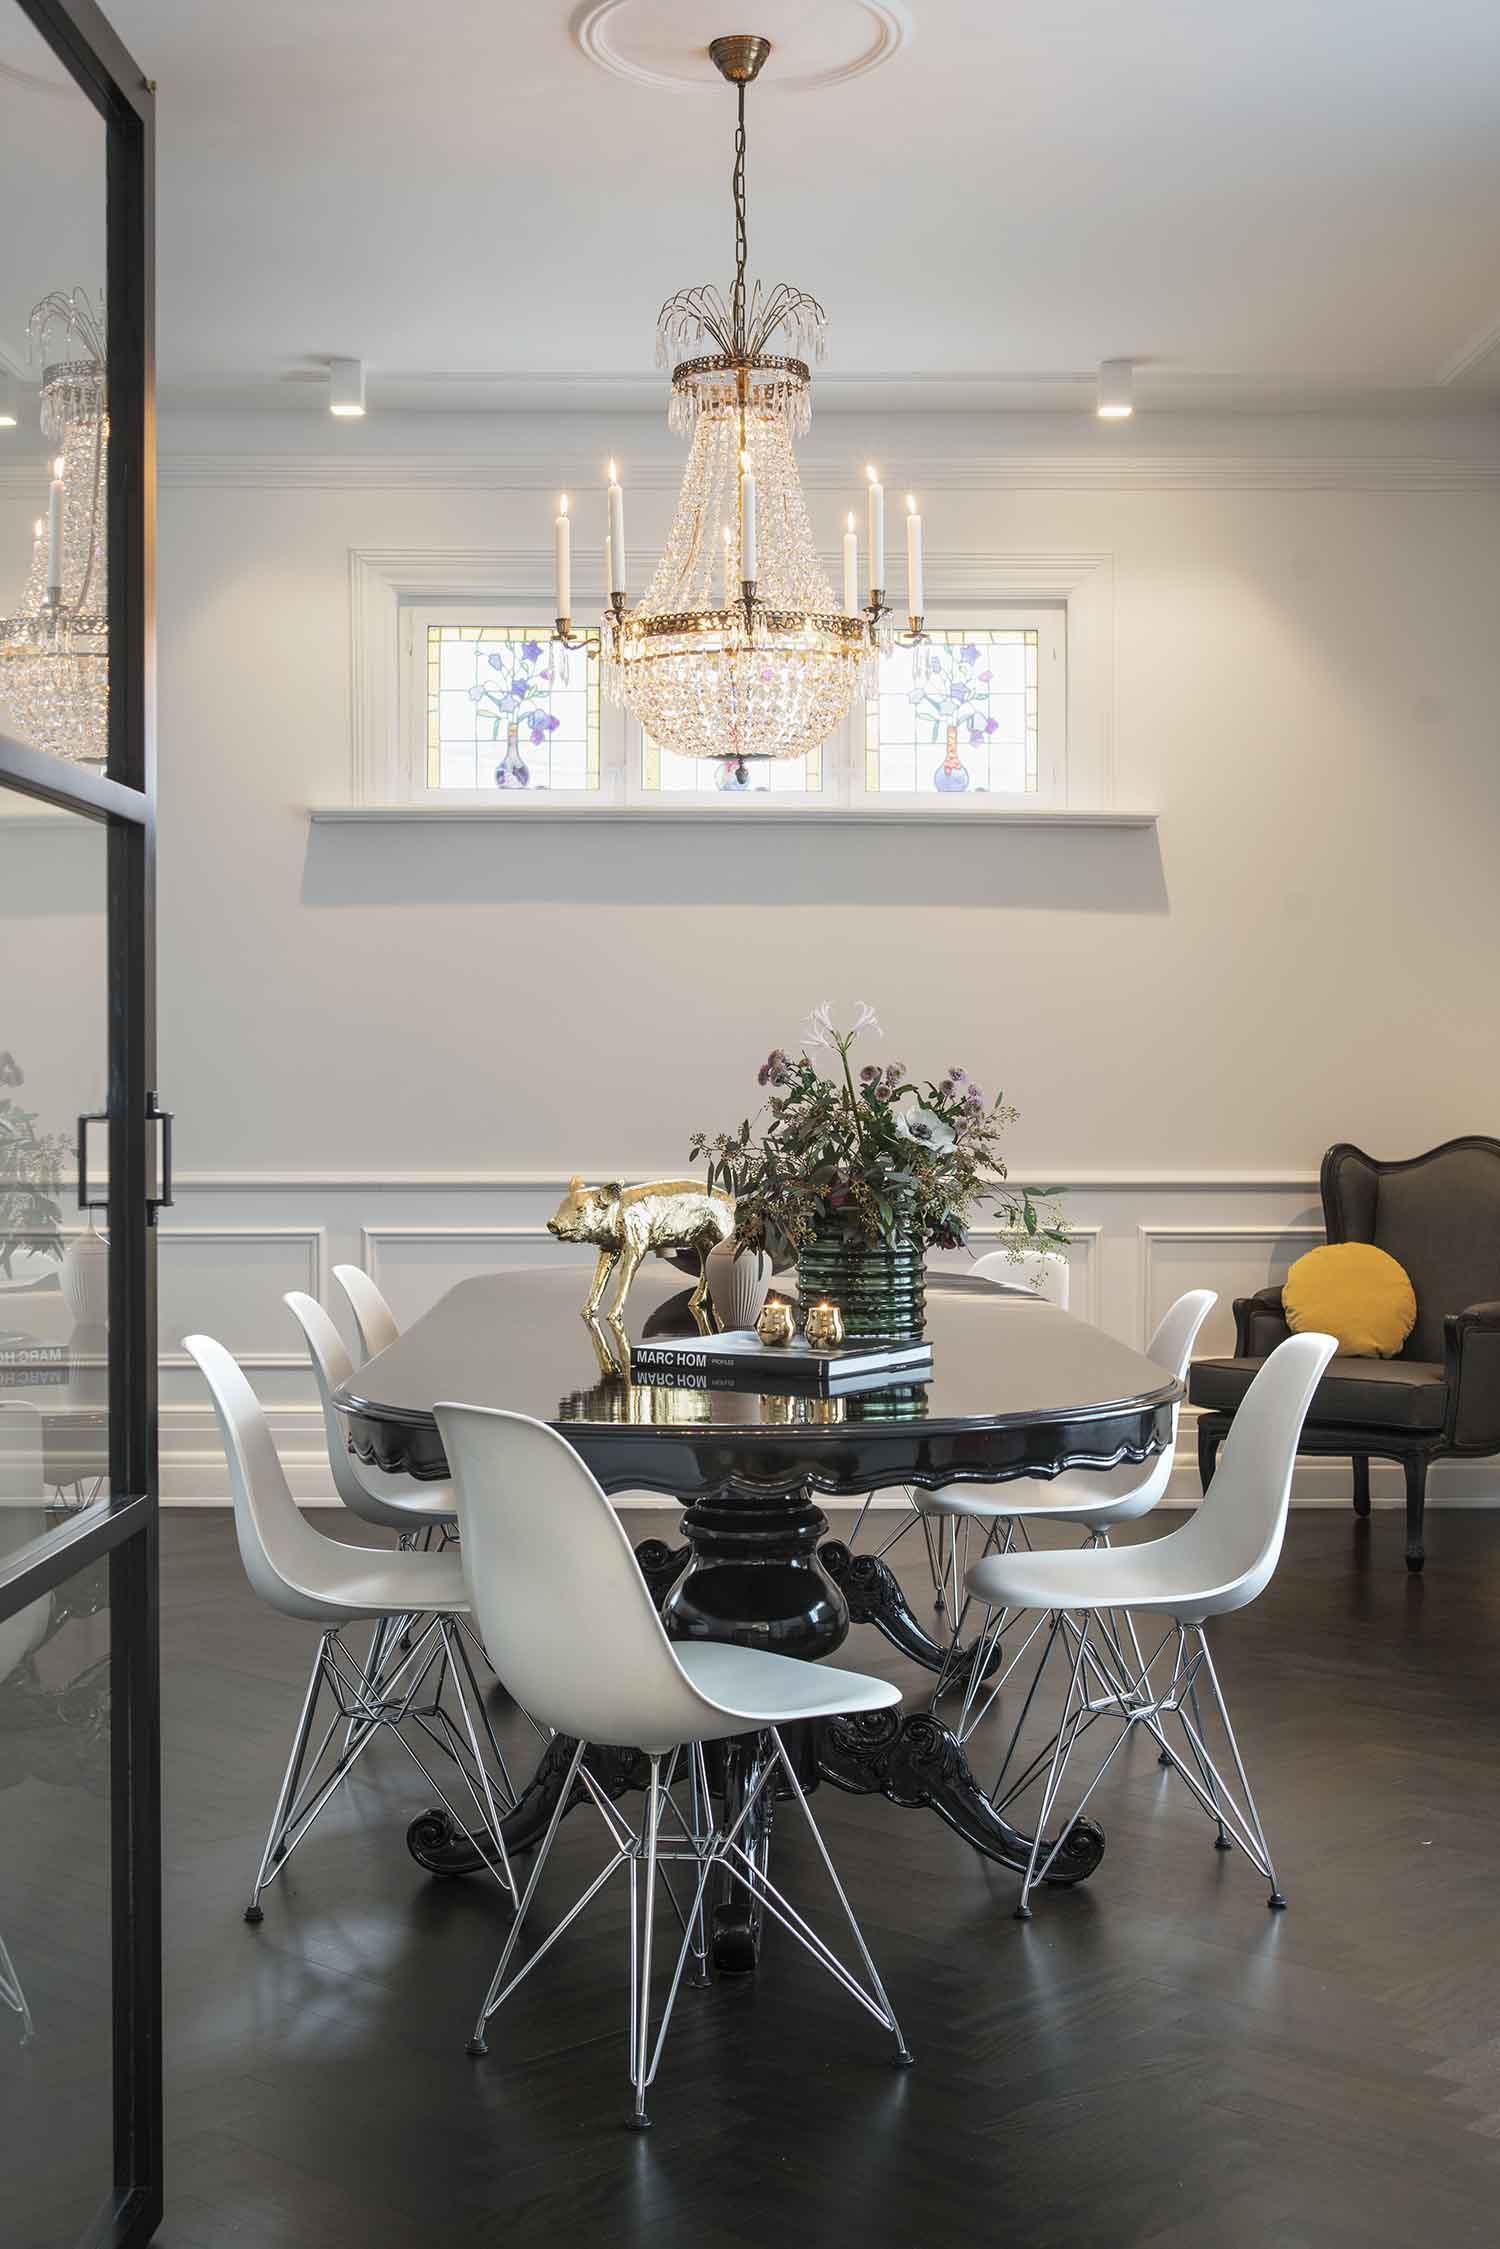 interiør, interiørarkitektur, ramsoskar, ramsøskar, spisestue, hjem, koselig